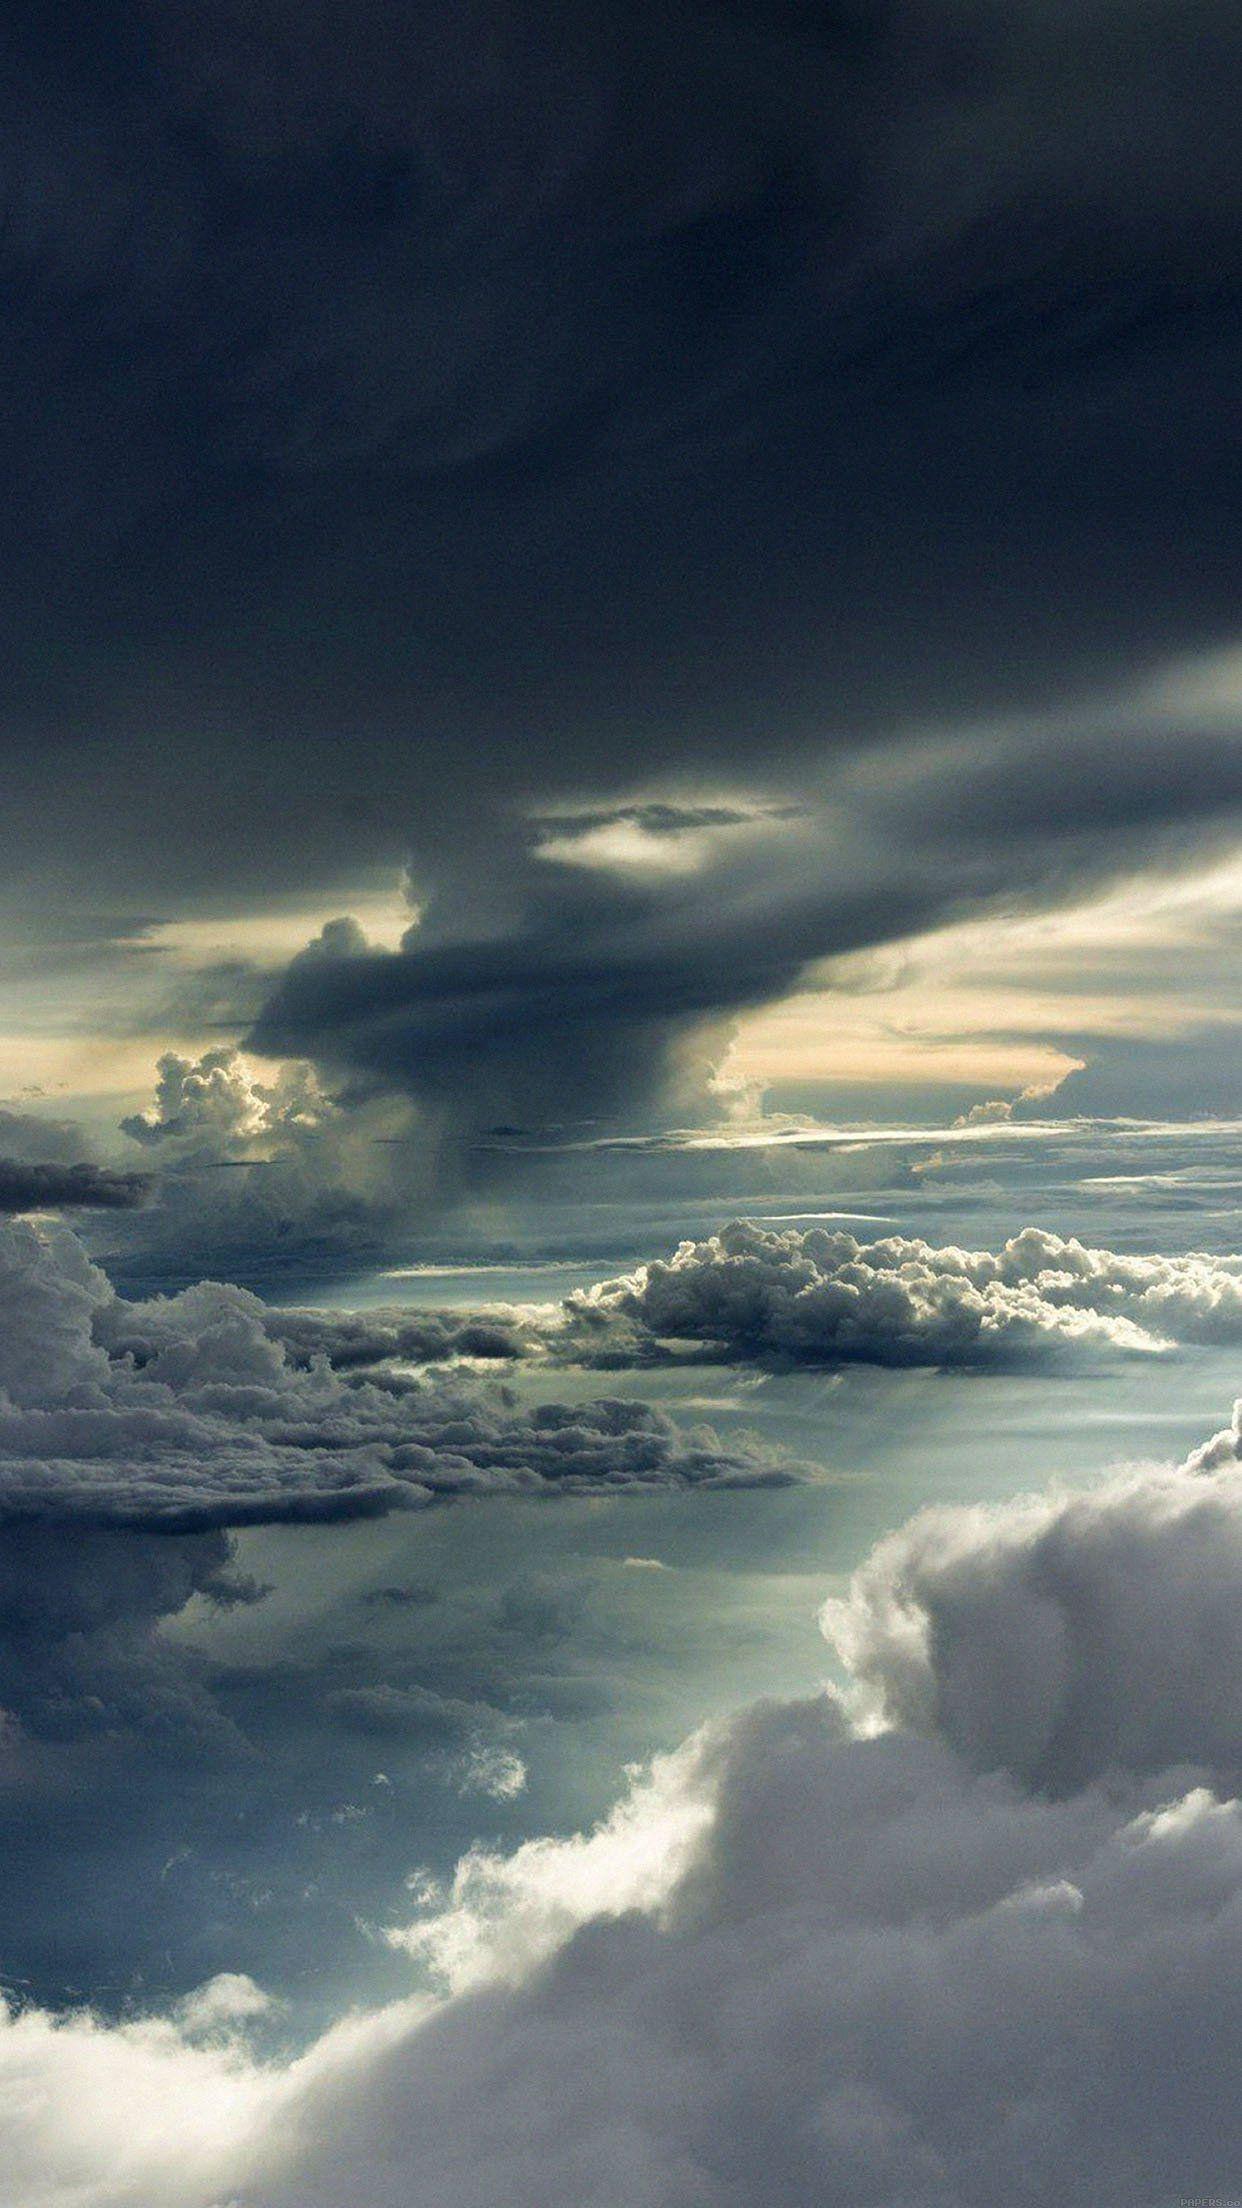 Pin by Sierra Comellas on WALLPAPERS Clouds, Cloud